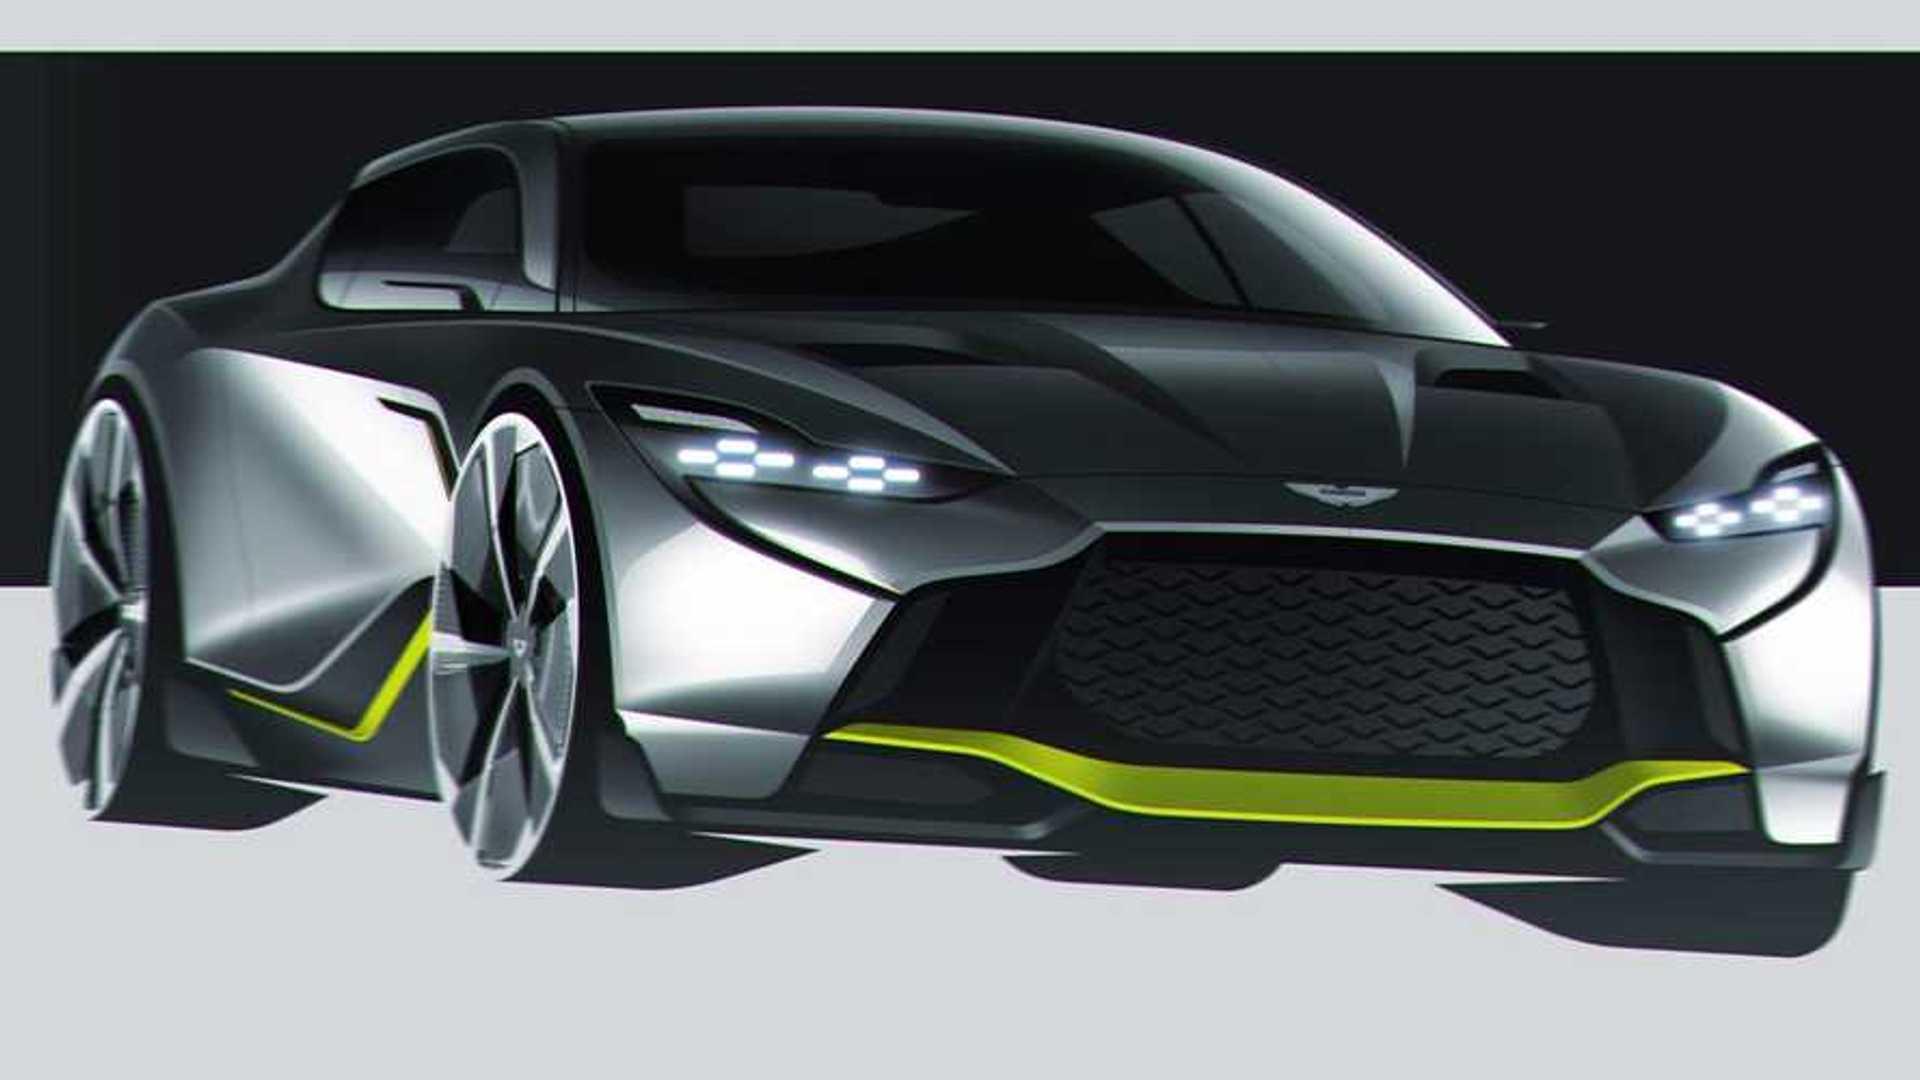 Aston Martin Db12 Amr Rendering Imagines James Bond S Future Ride